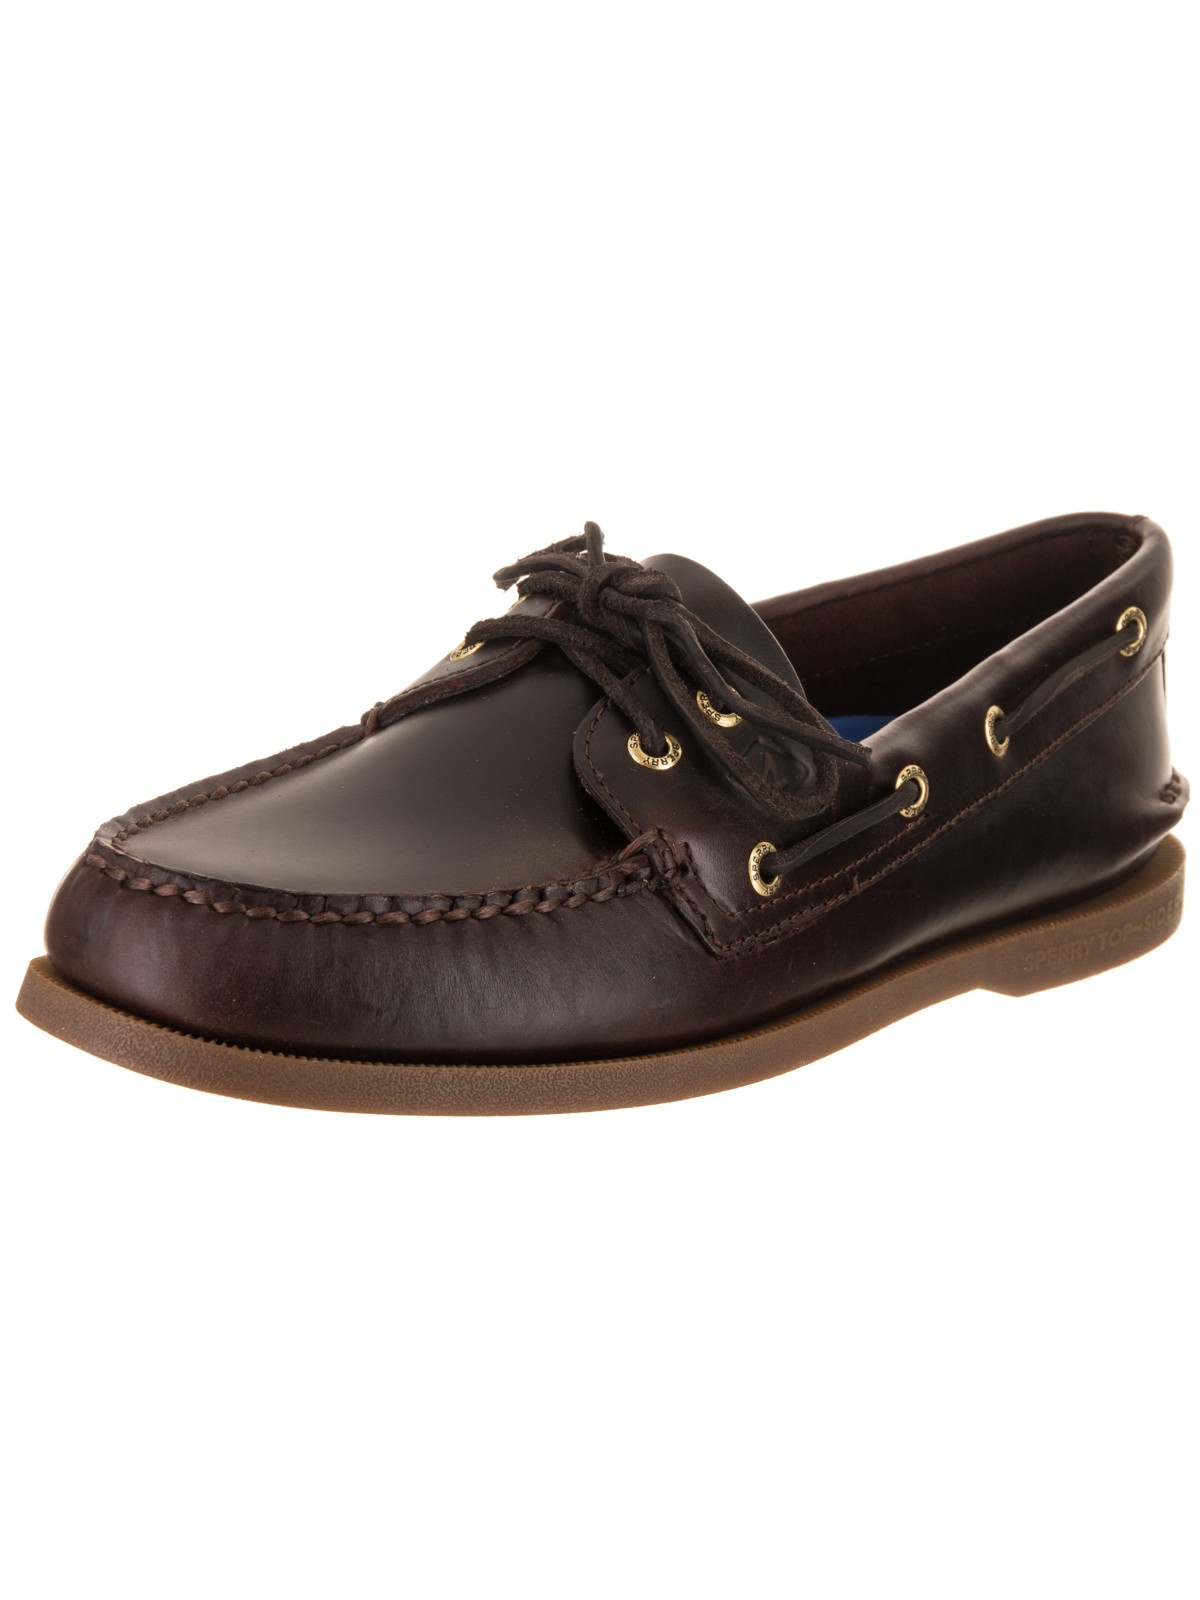 sperry top-sider men's authentic original boat shoe,amaretto,7.5 m us